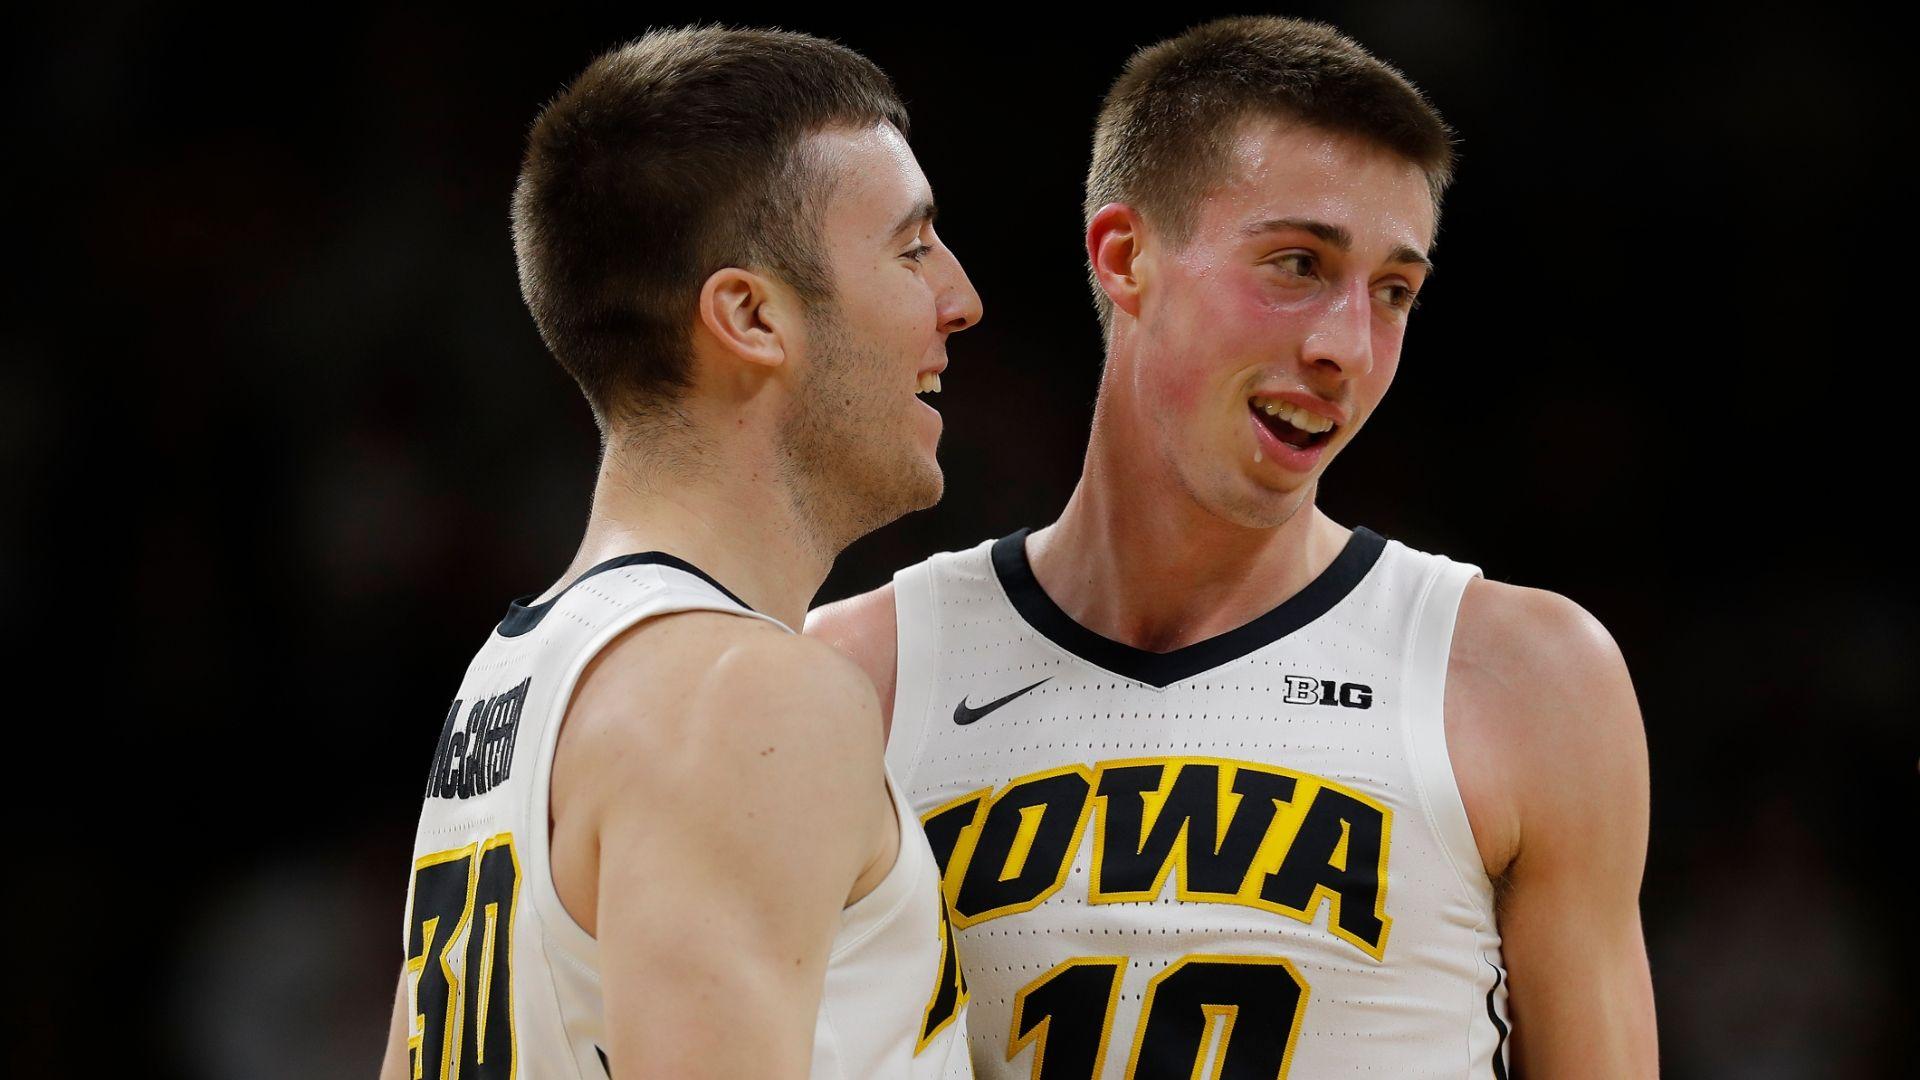 Wieskamp scores 24, No. 23 Iowa routs Illinois 95-71